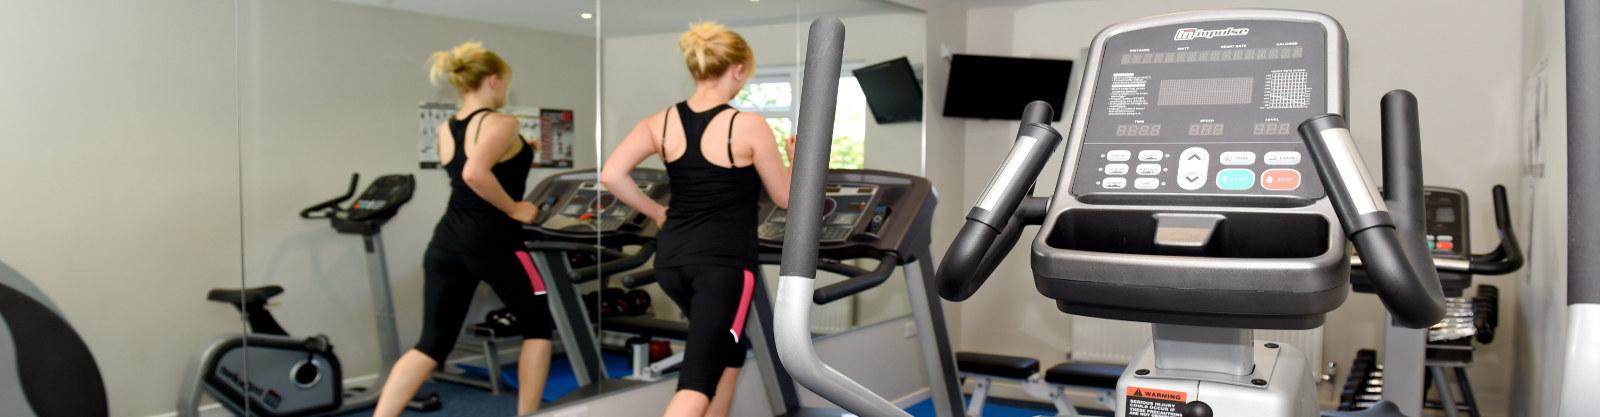 Fitness & Leisure Club Bournemouth